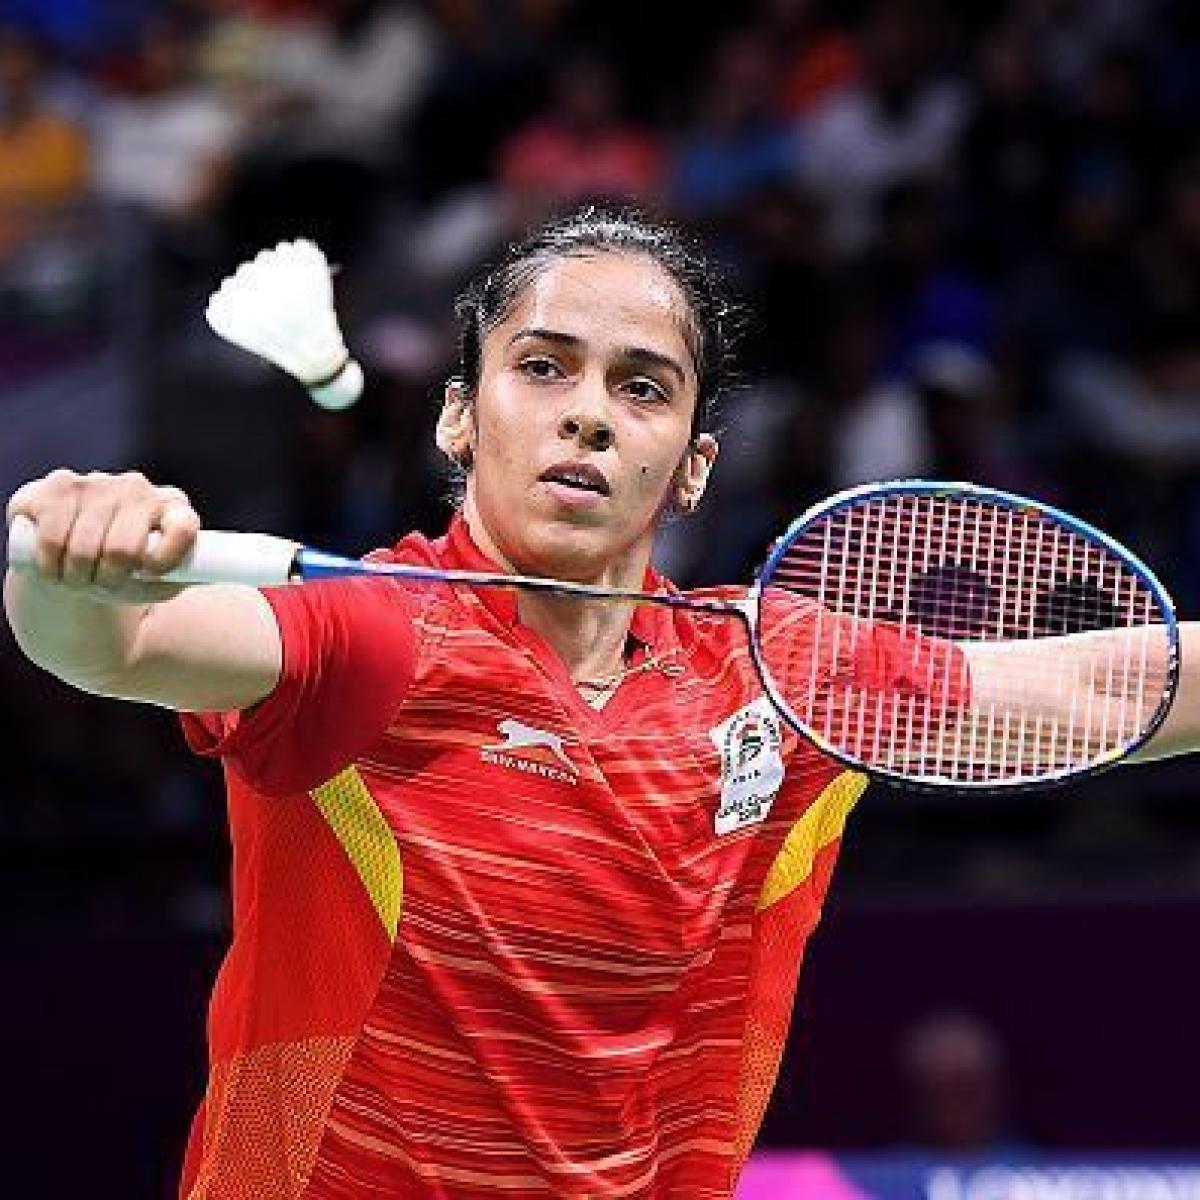 Thailand Open: Saina Nehwal cruises into second round with win over Malaysia's Kisona Selvaduray